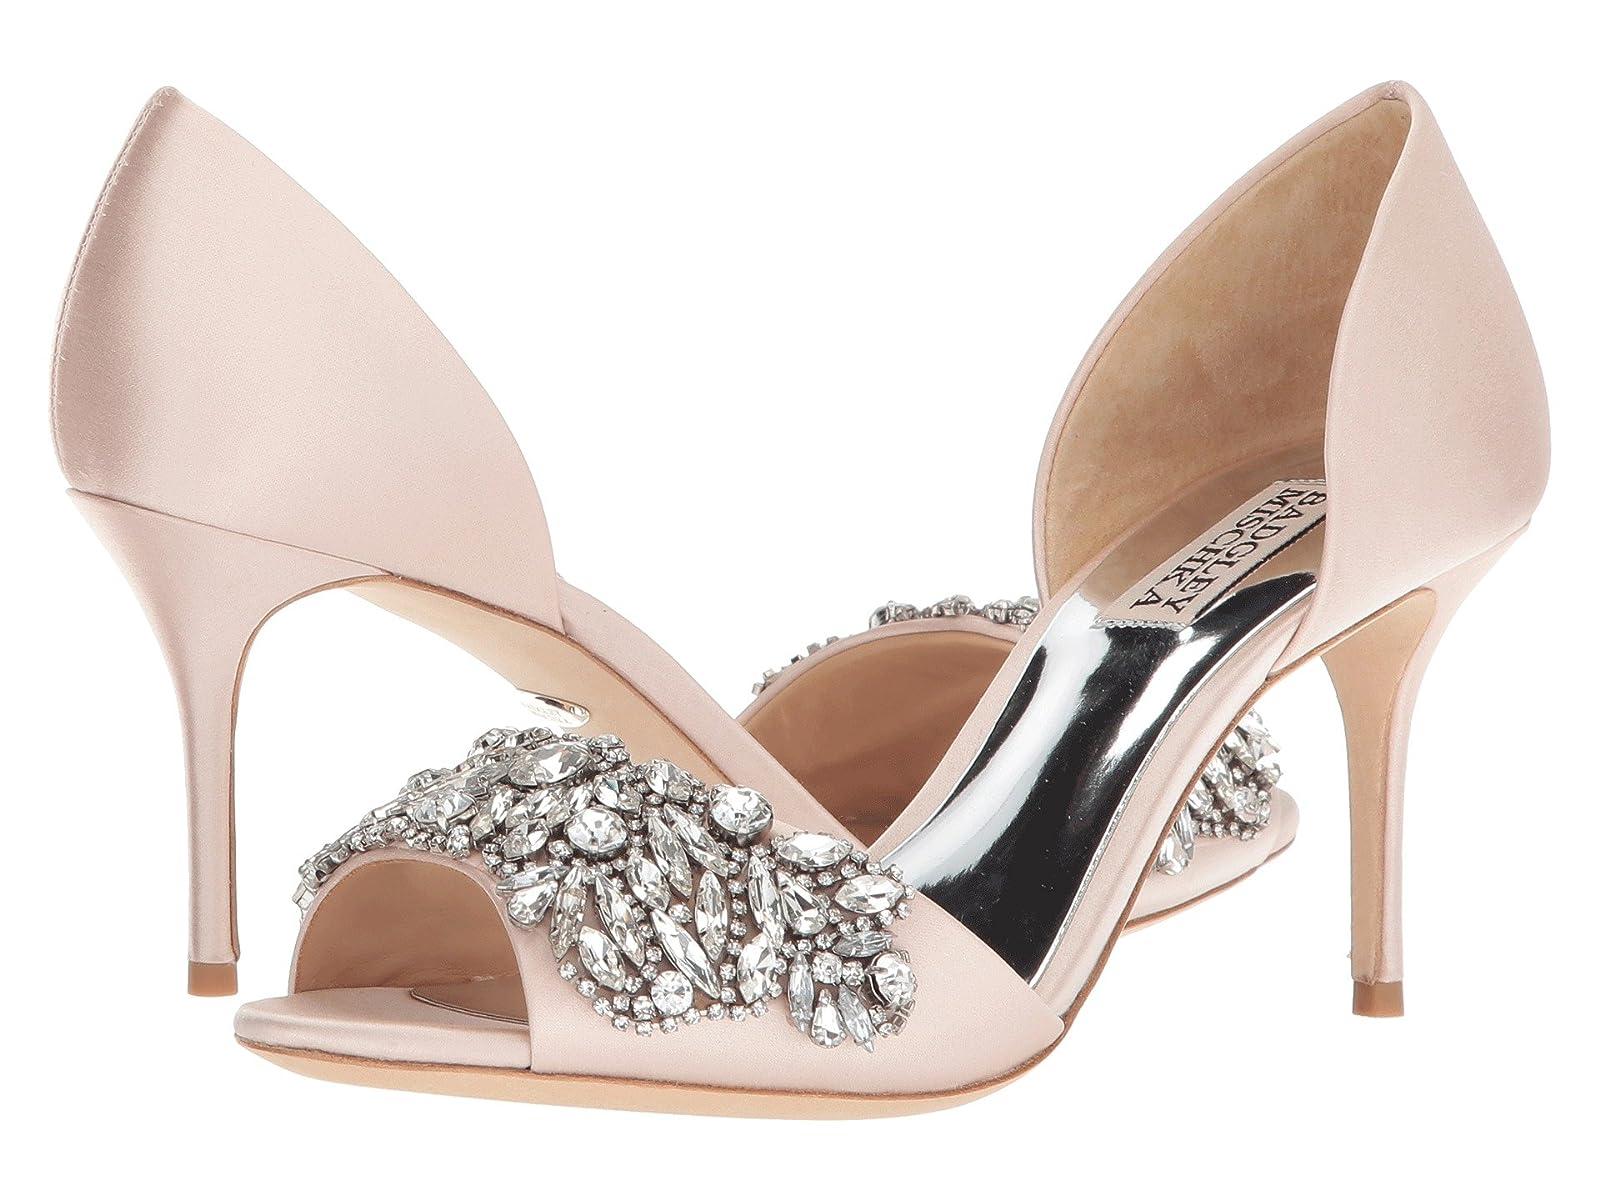 Badgley Mischka HansenCheap and distinctive eye-catching shoes